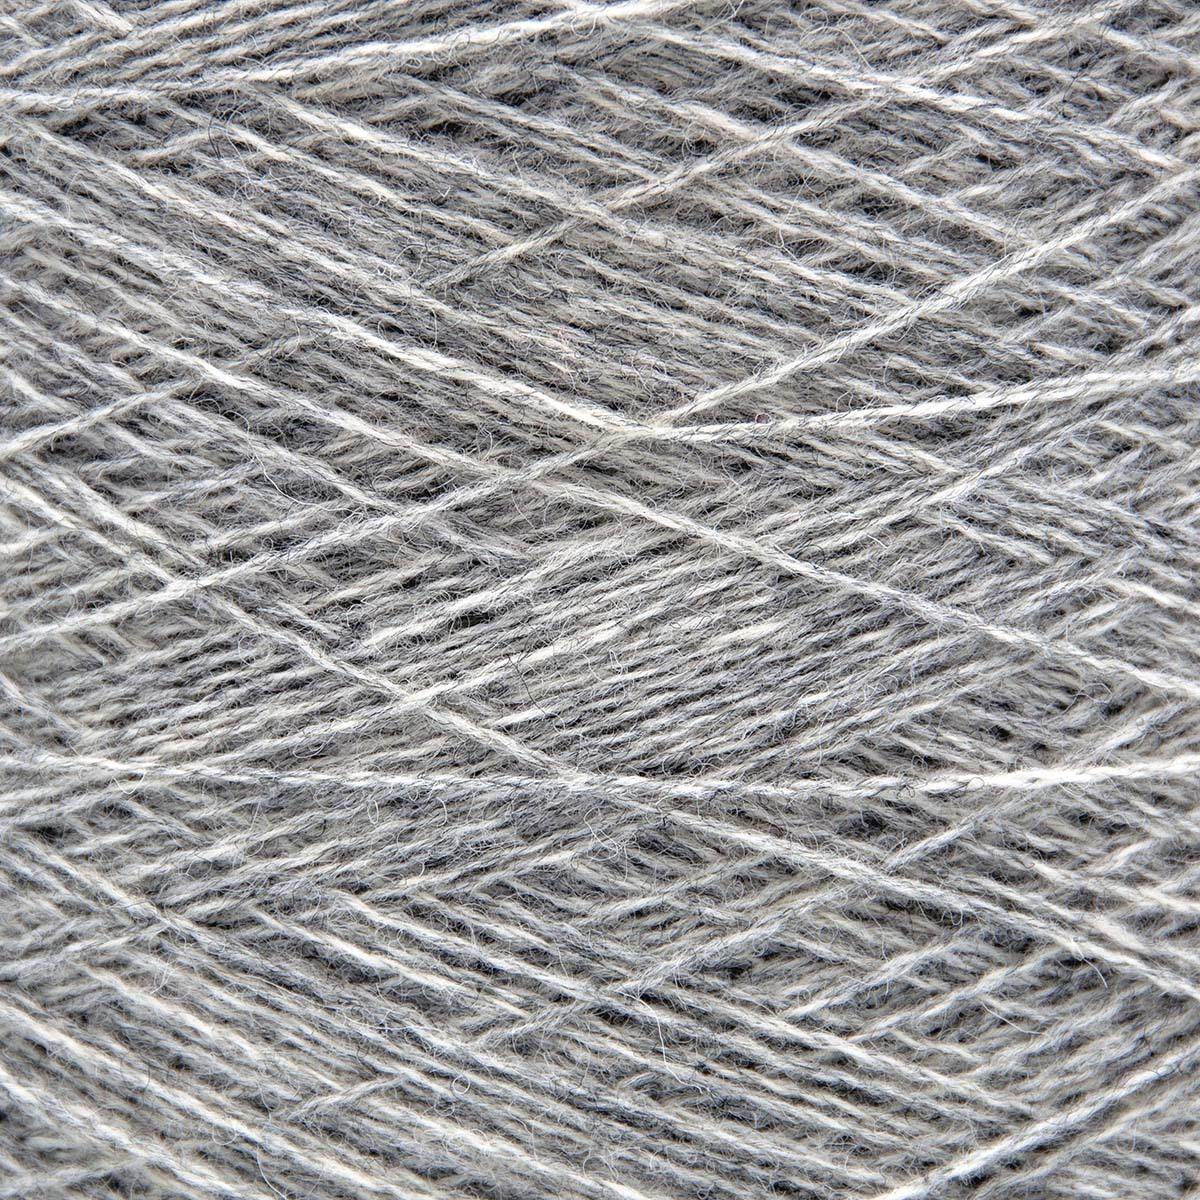 Knoll Yarns Shetland - 003